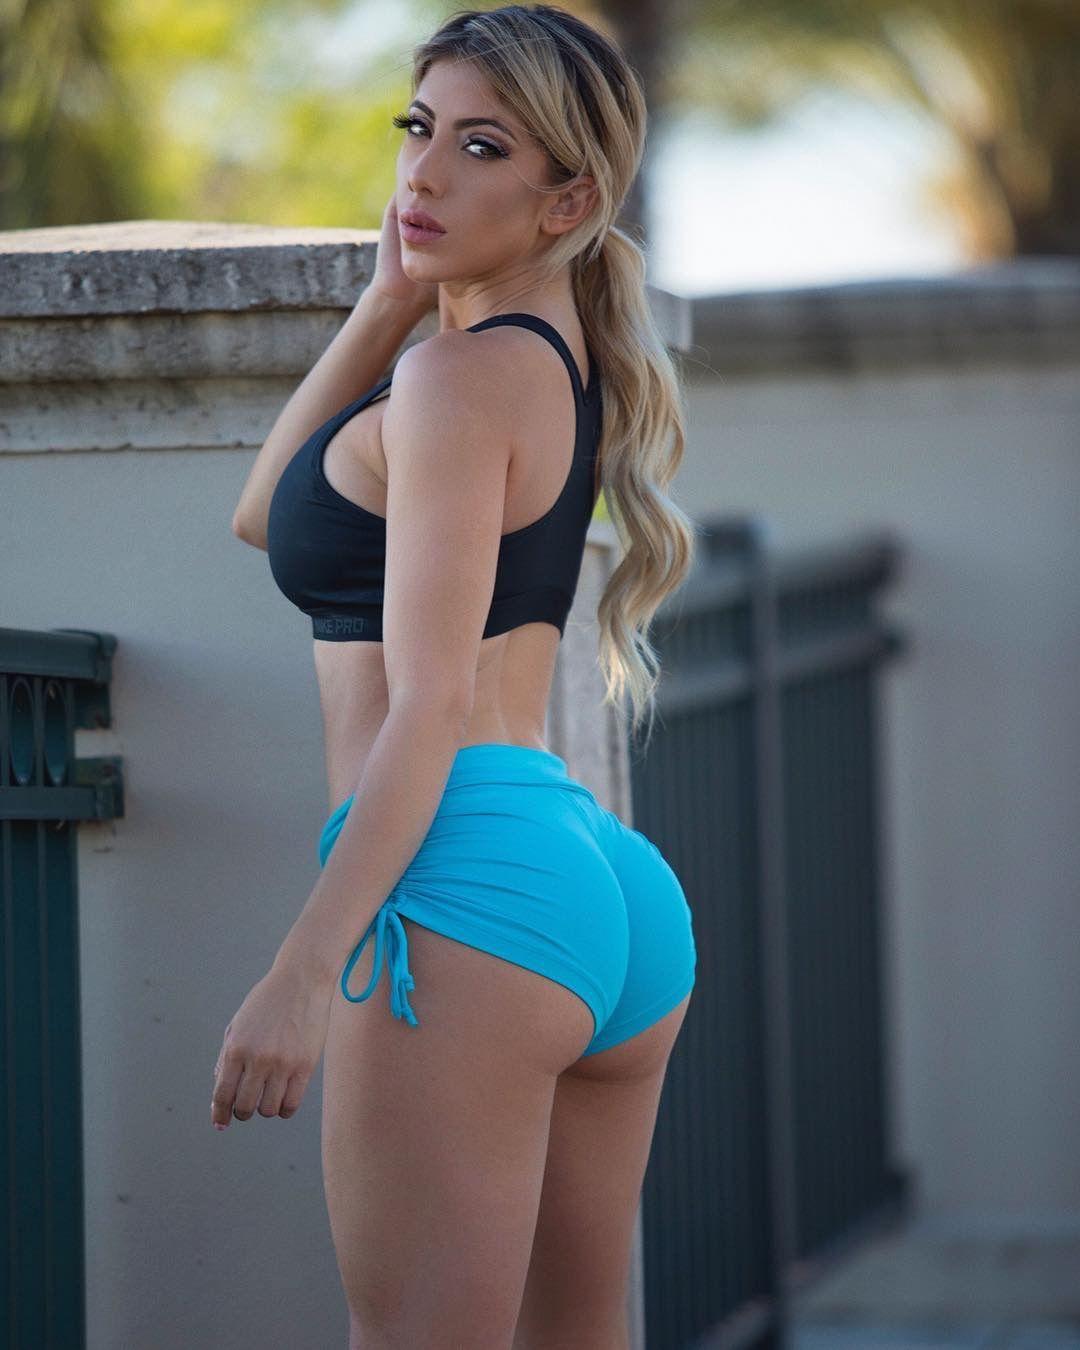 Feet Giulia Coppini nude (34 foto and video), Ass, Paparazzi, Instagram, panties 2015